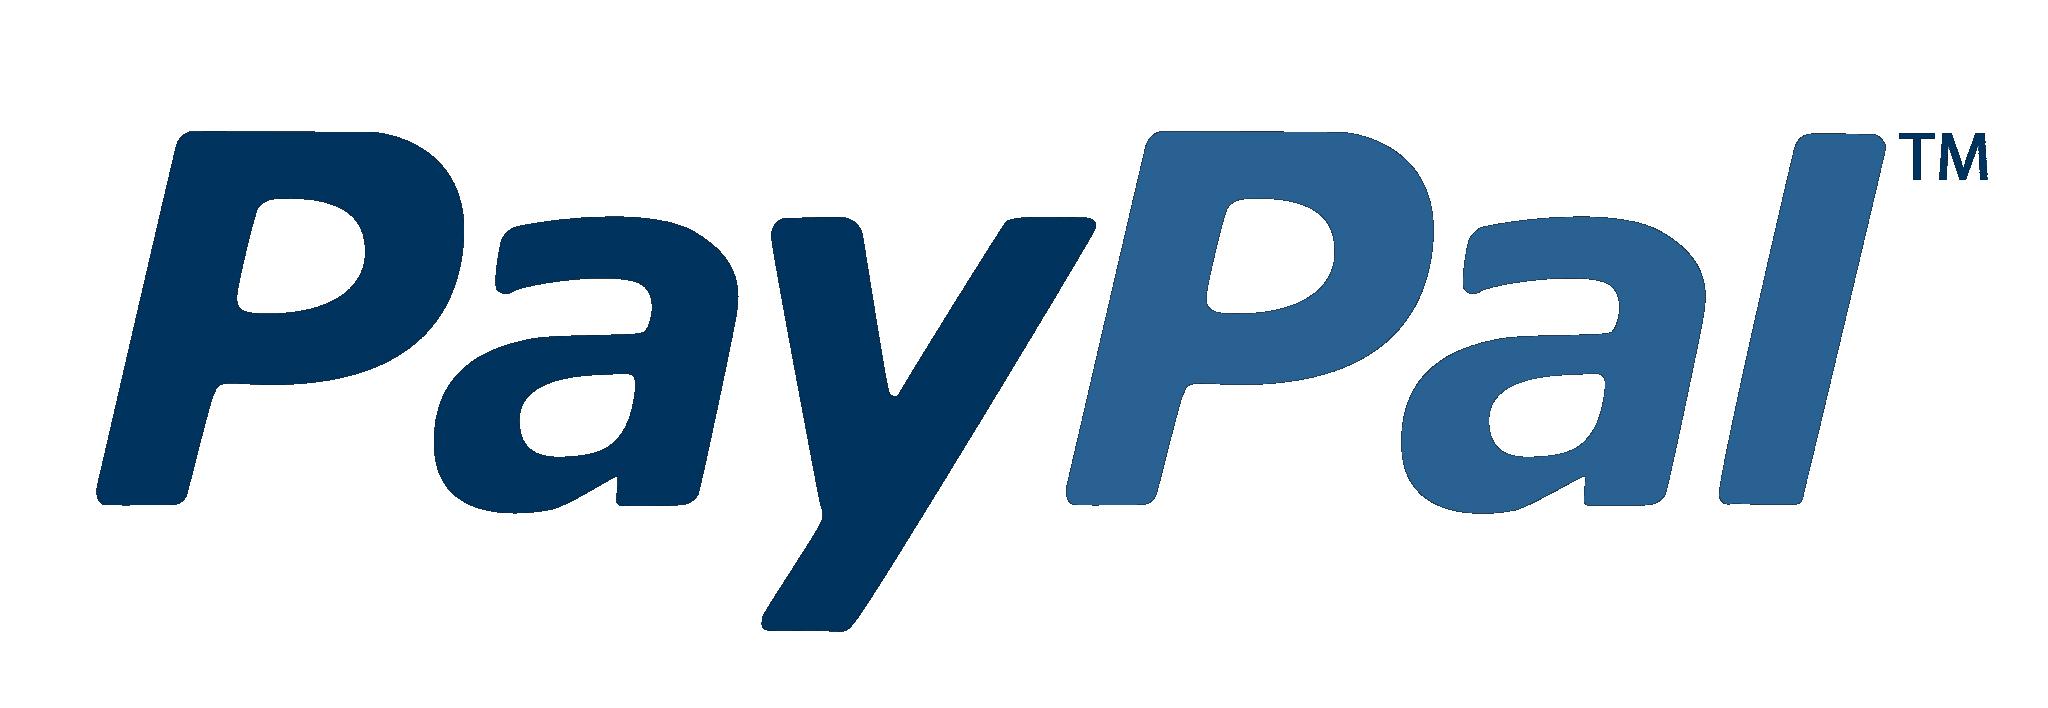 pazypal